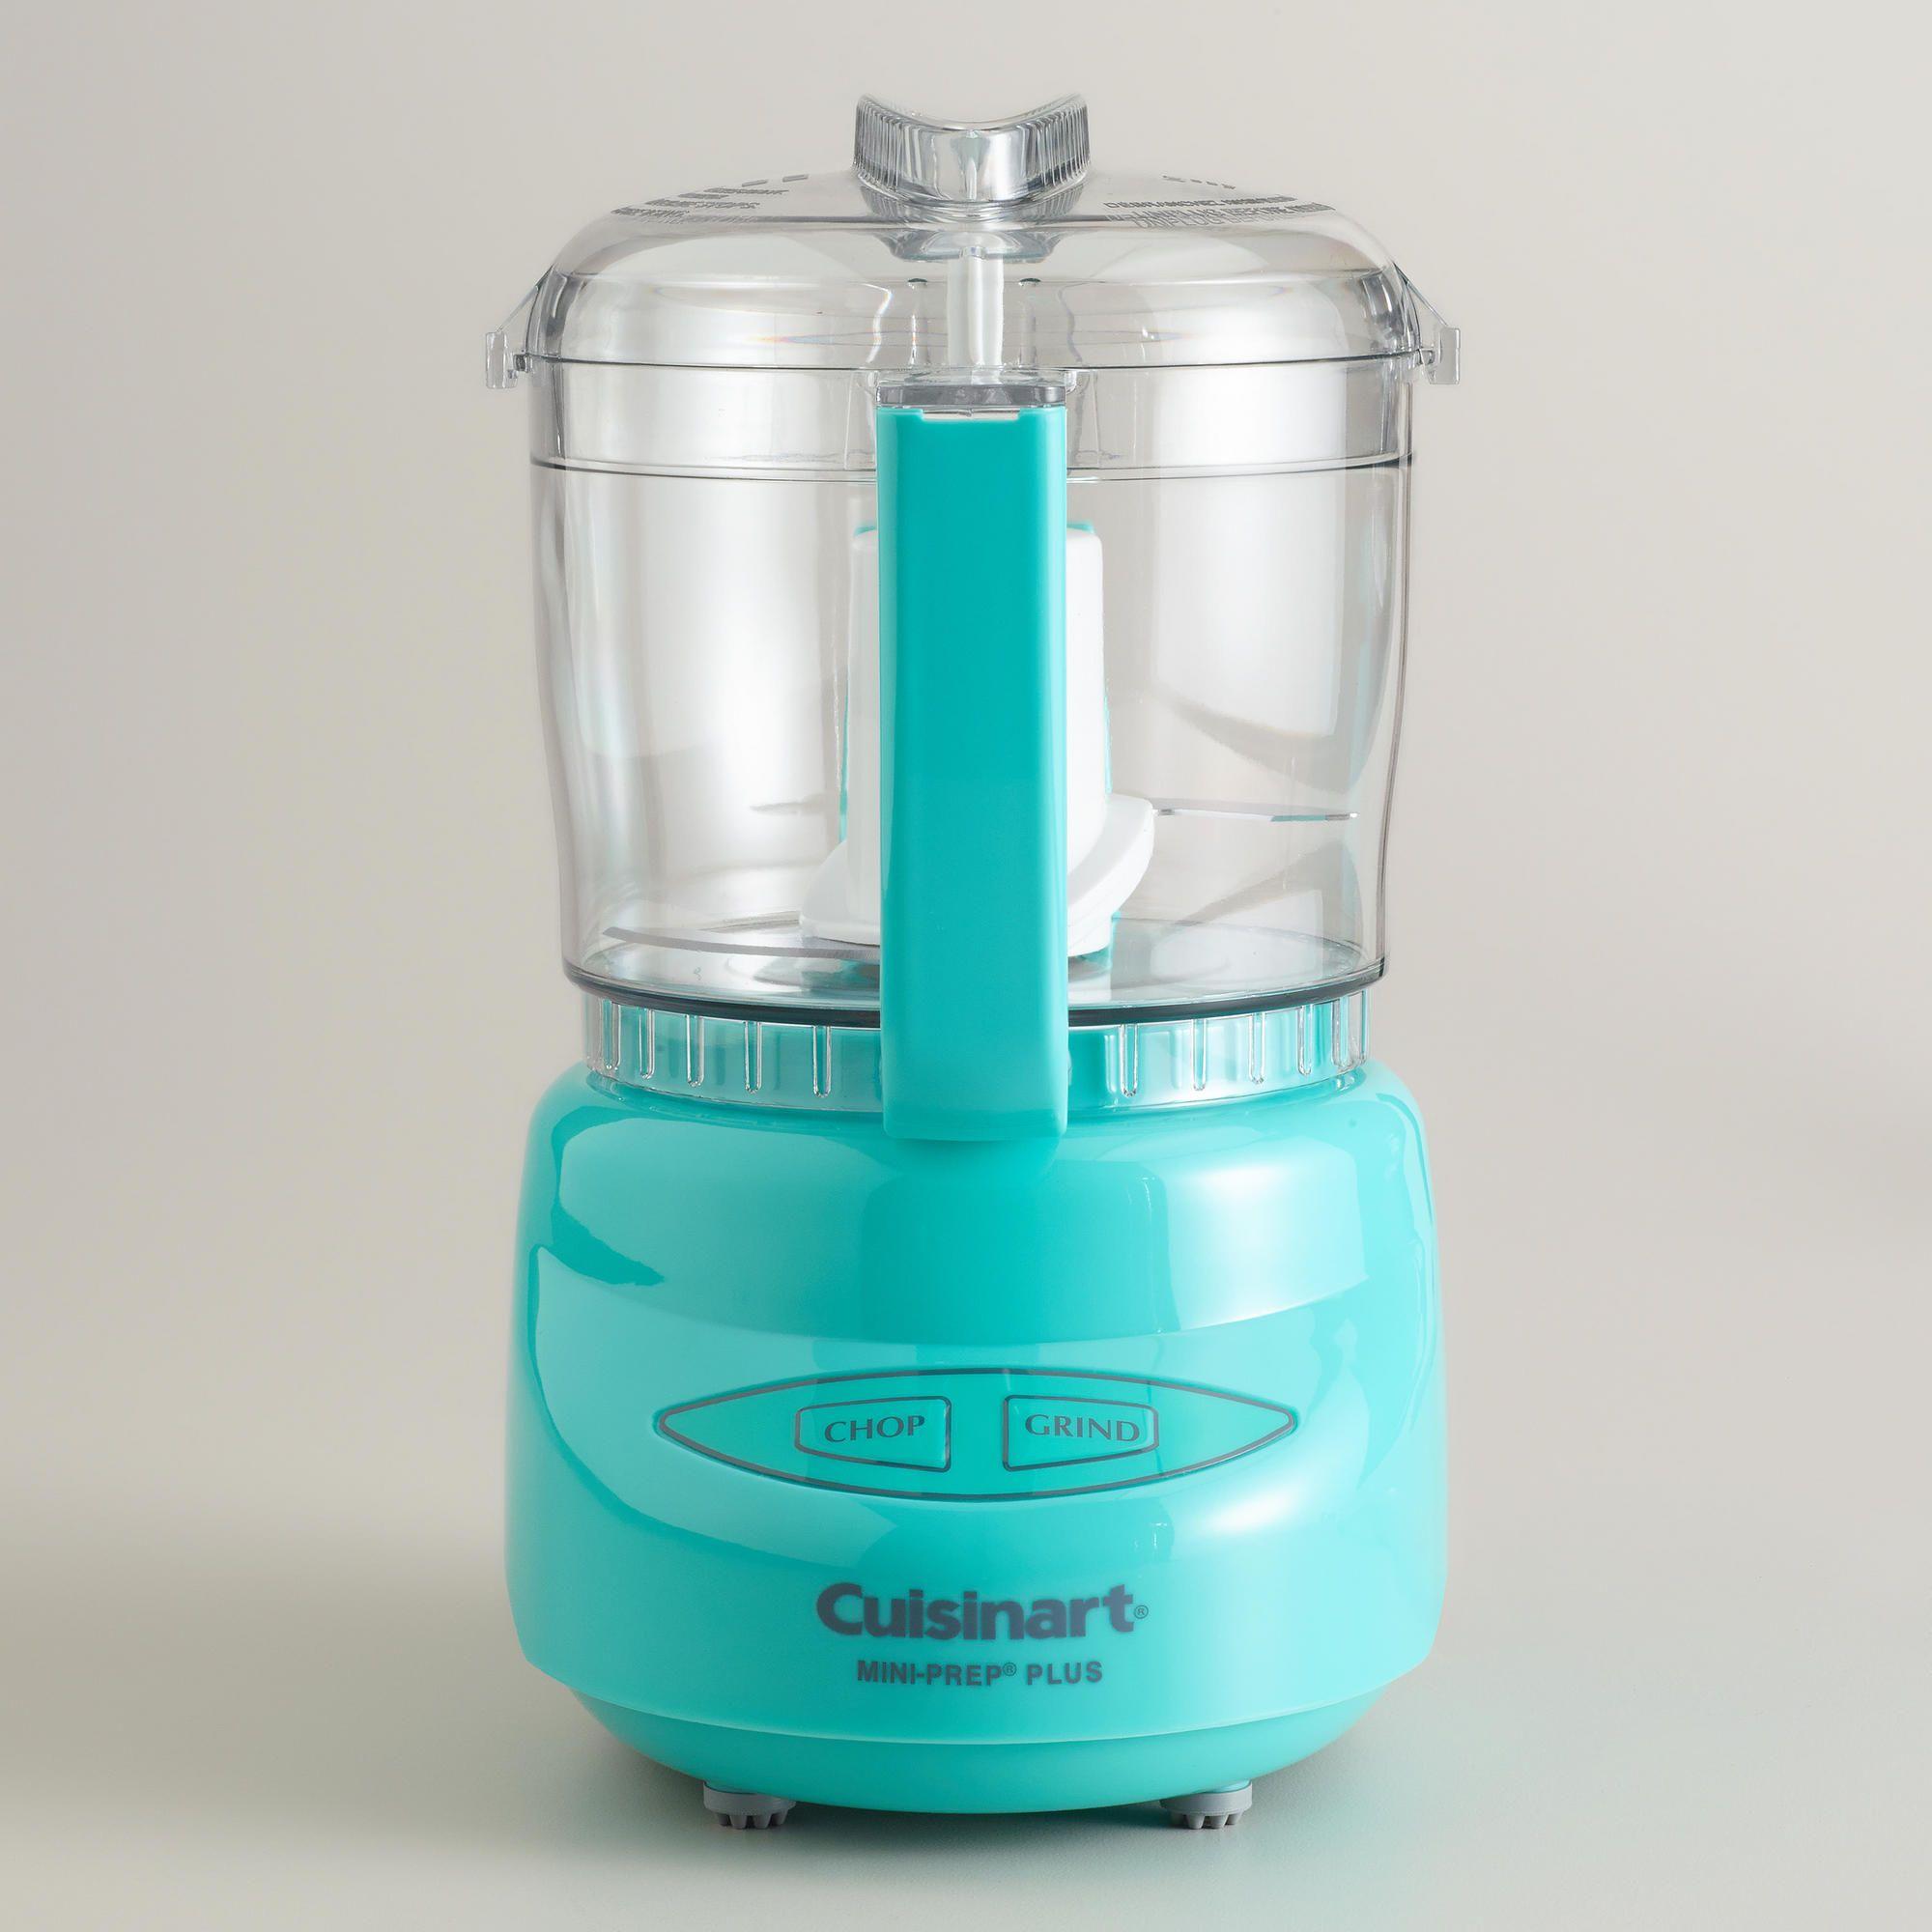 Cuisinart Mini-Prep Plus Food Processor from World Market ($42.99 ...